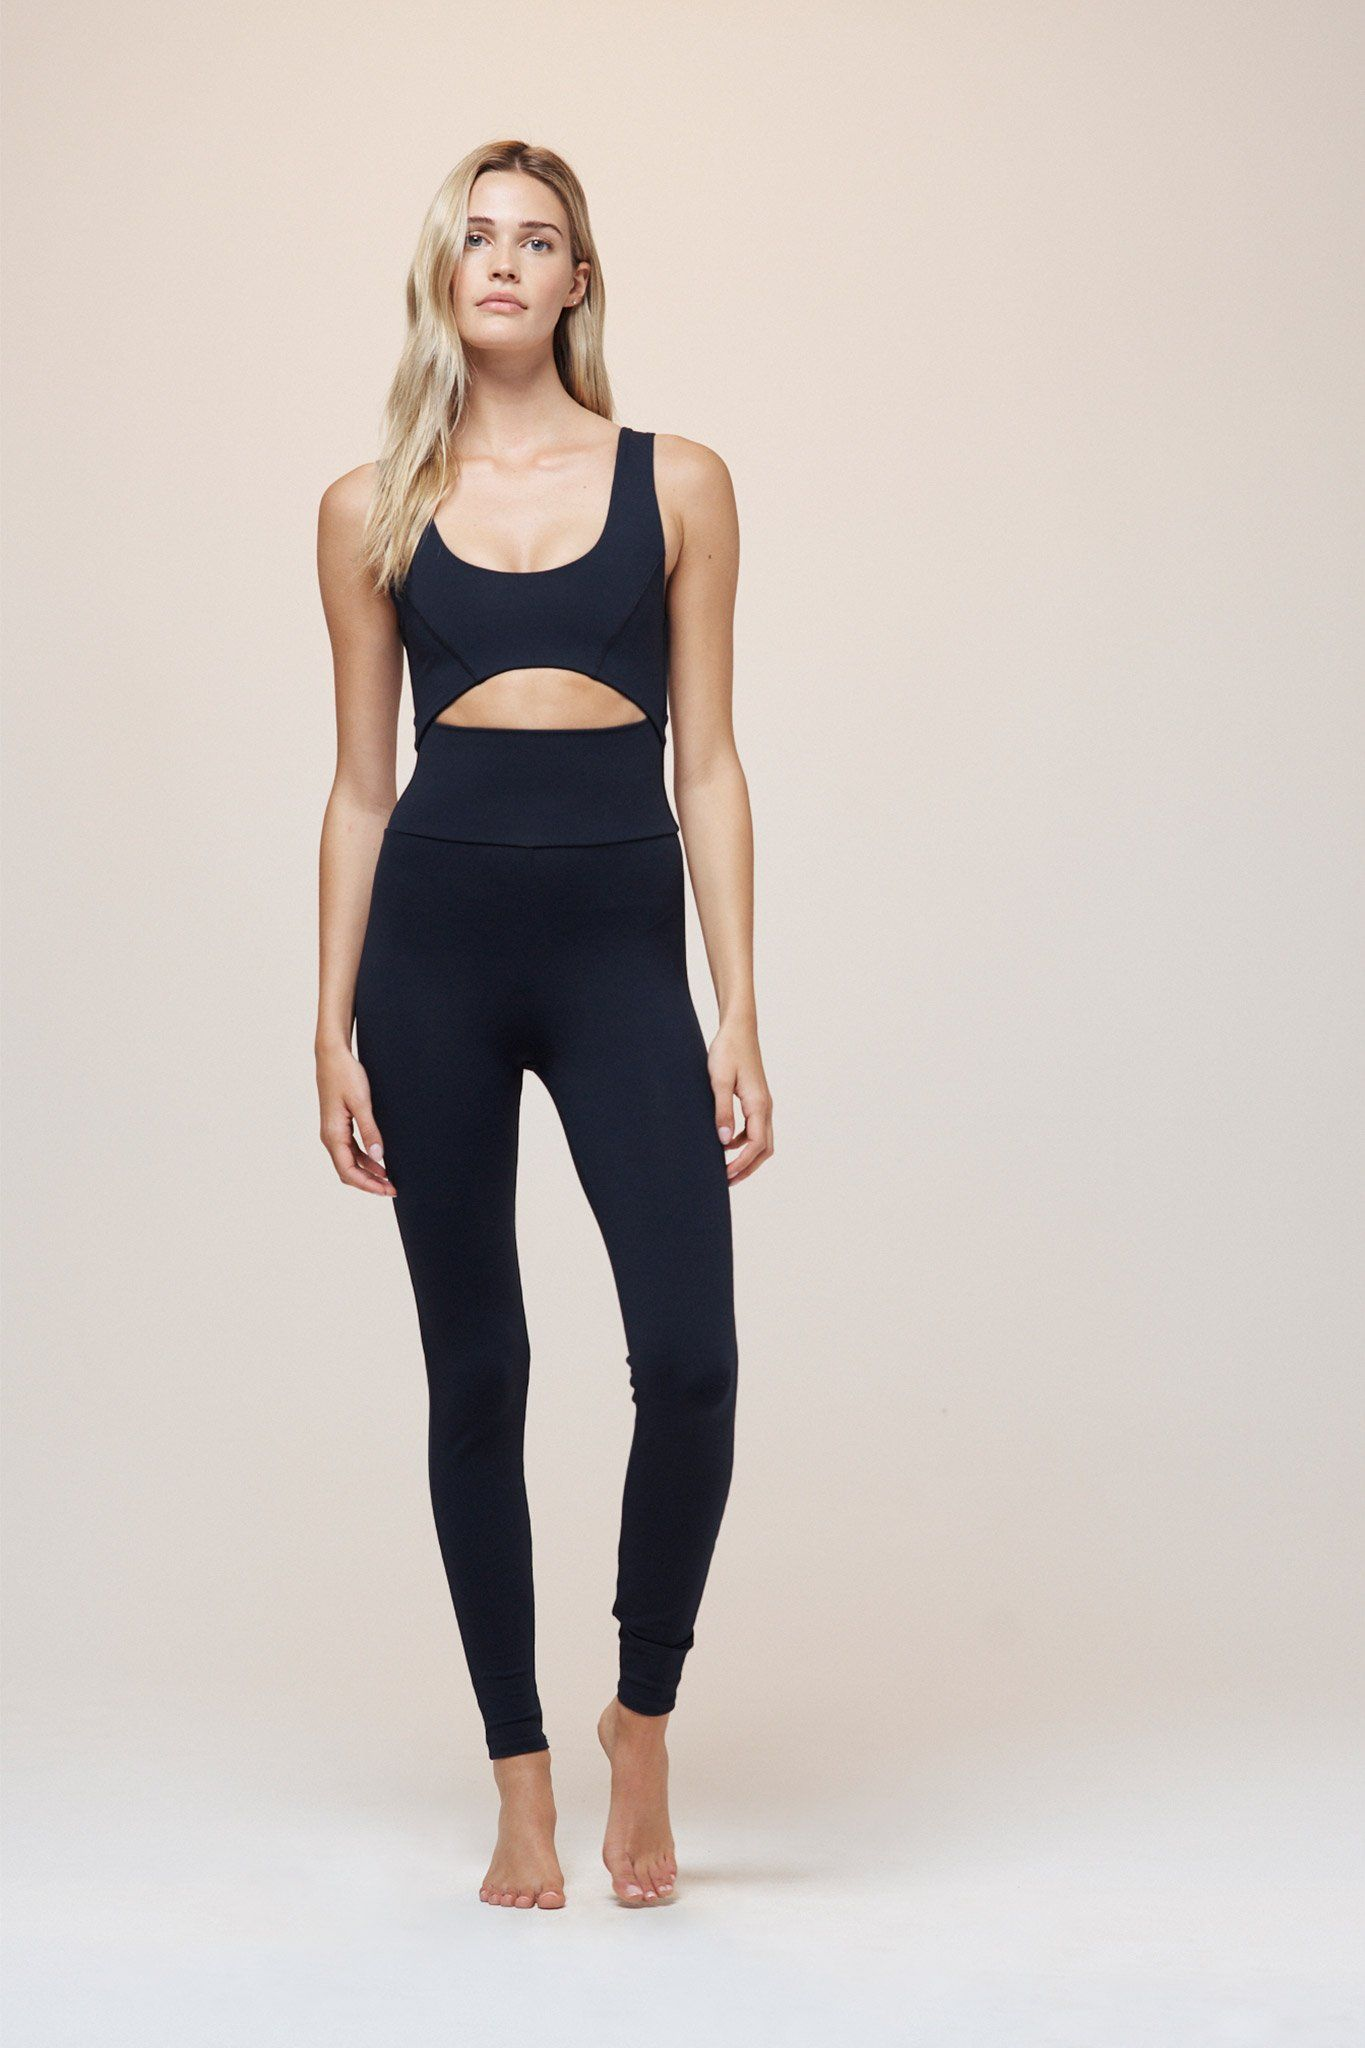 4a5e96b8f25b19 Cutout Bodysuit Workout Aesthetic, Gym Leggings, Workout Leggings, Workout  Bodysuit, Dance Outfits